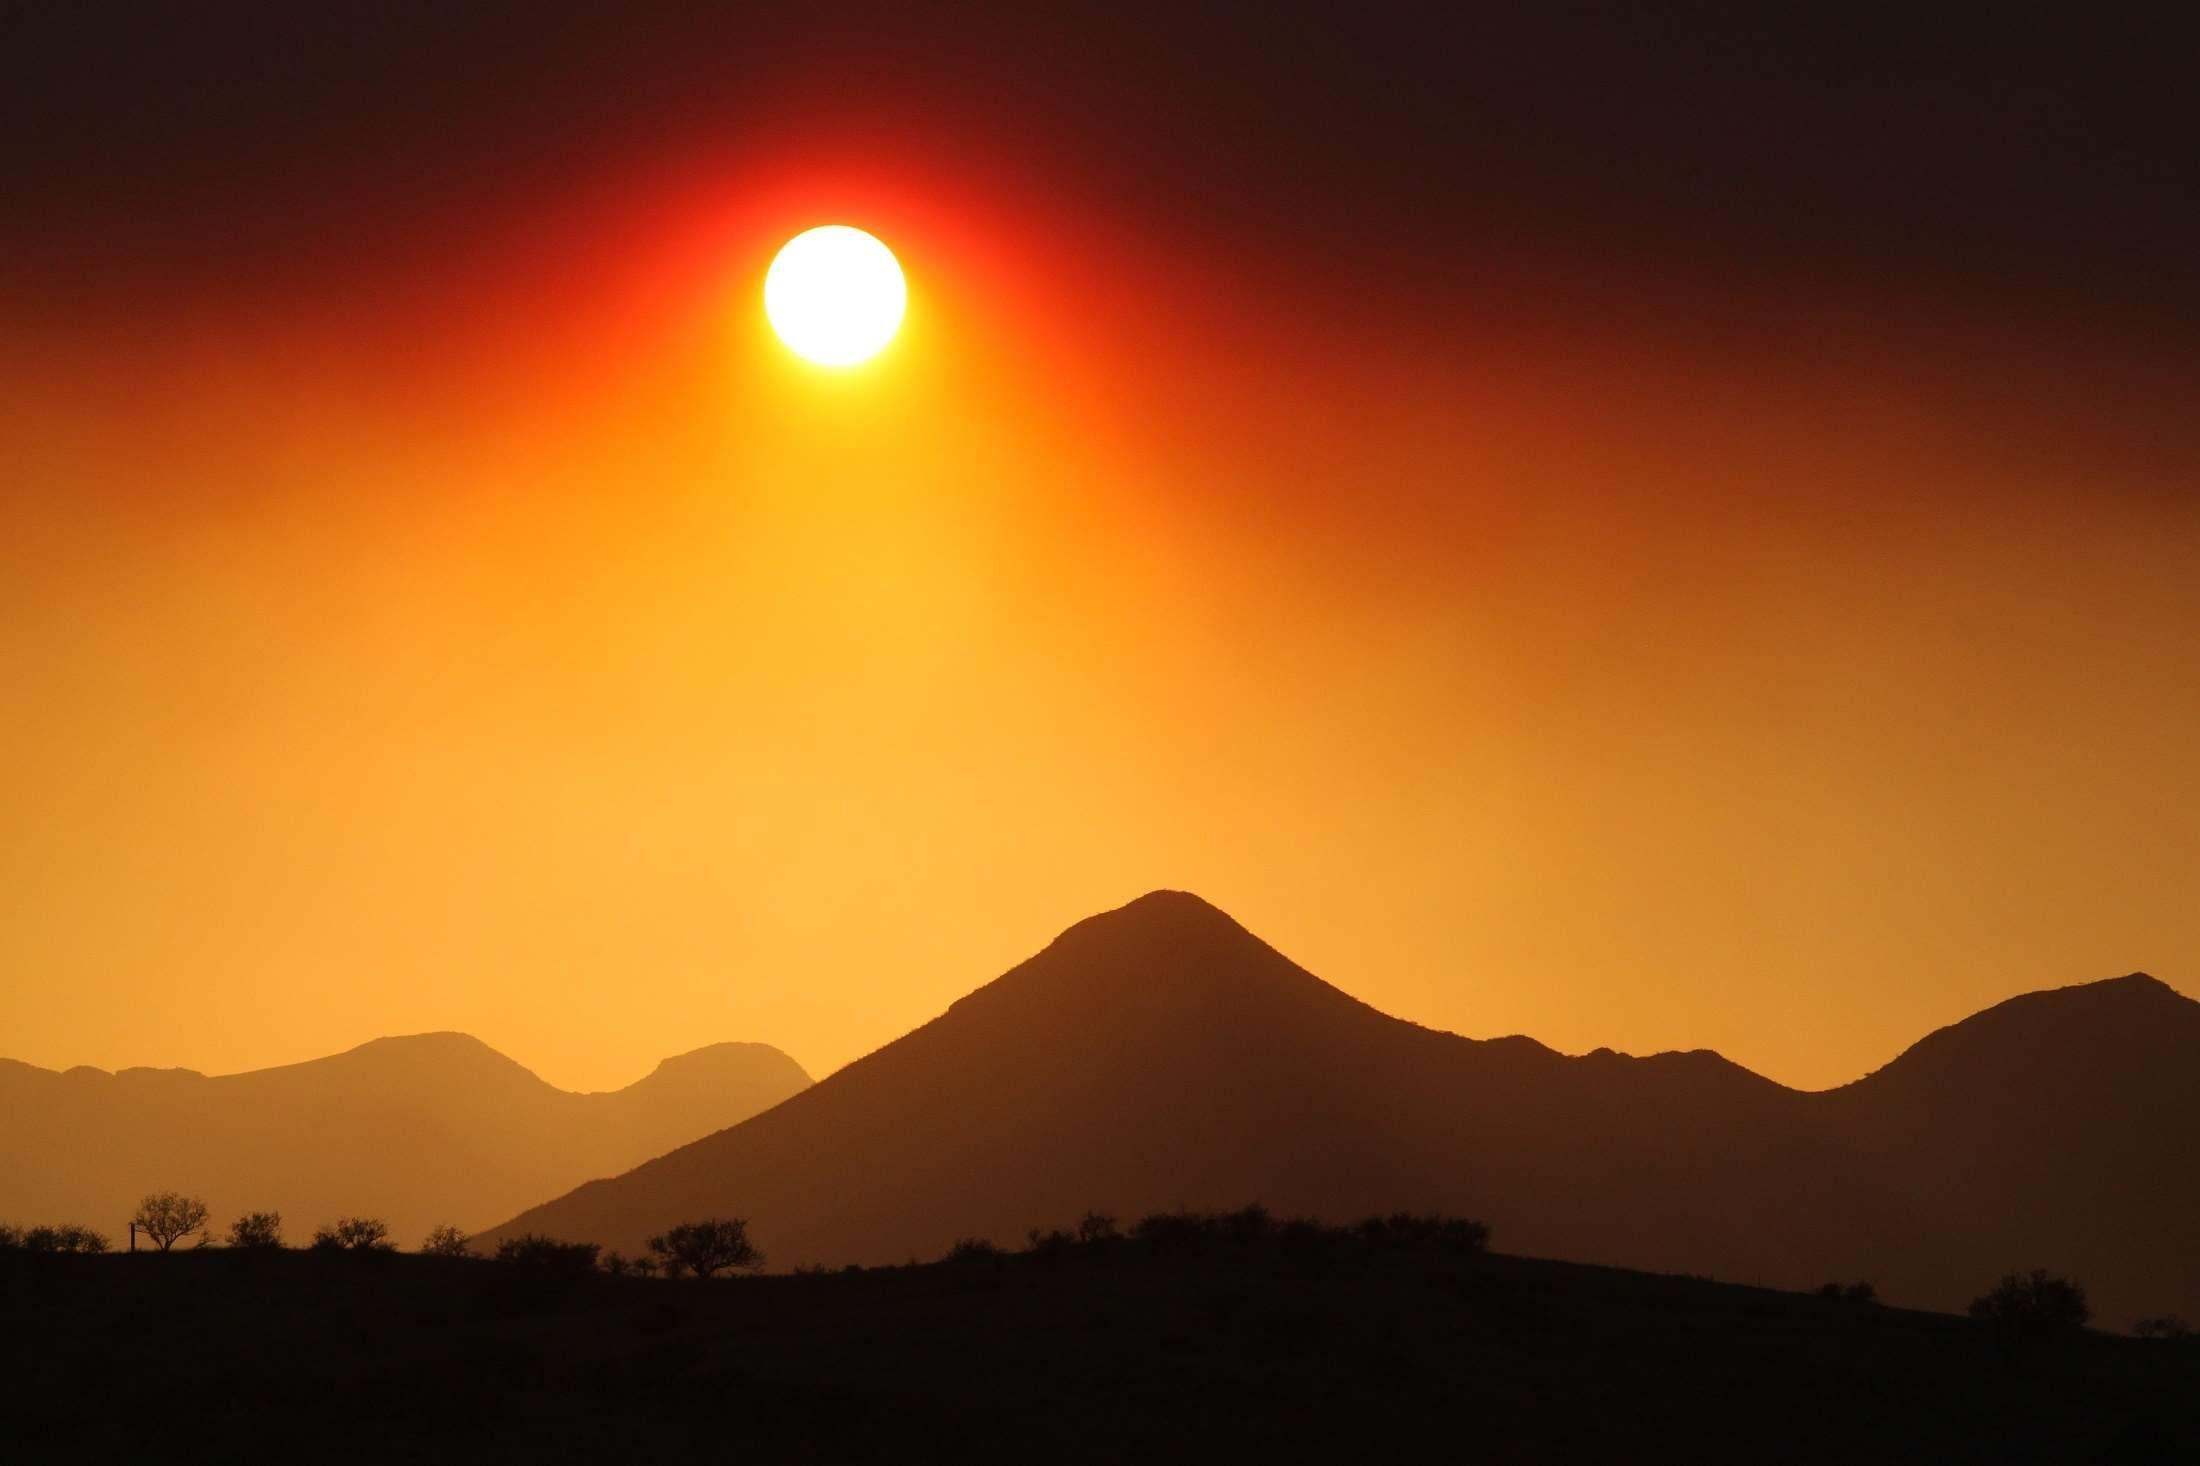 Backlit Clouds Dawn Desert Dusk Evening Fog Landscape Light Moon Mountain Range Mountains Na Take Better Photos Silhouette Photography Photography Sunrise morning fog mountain range dawn